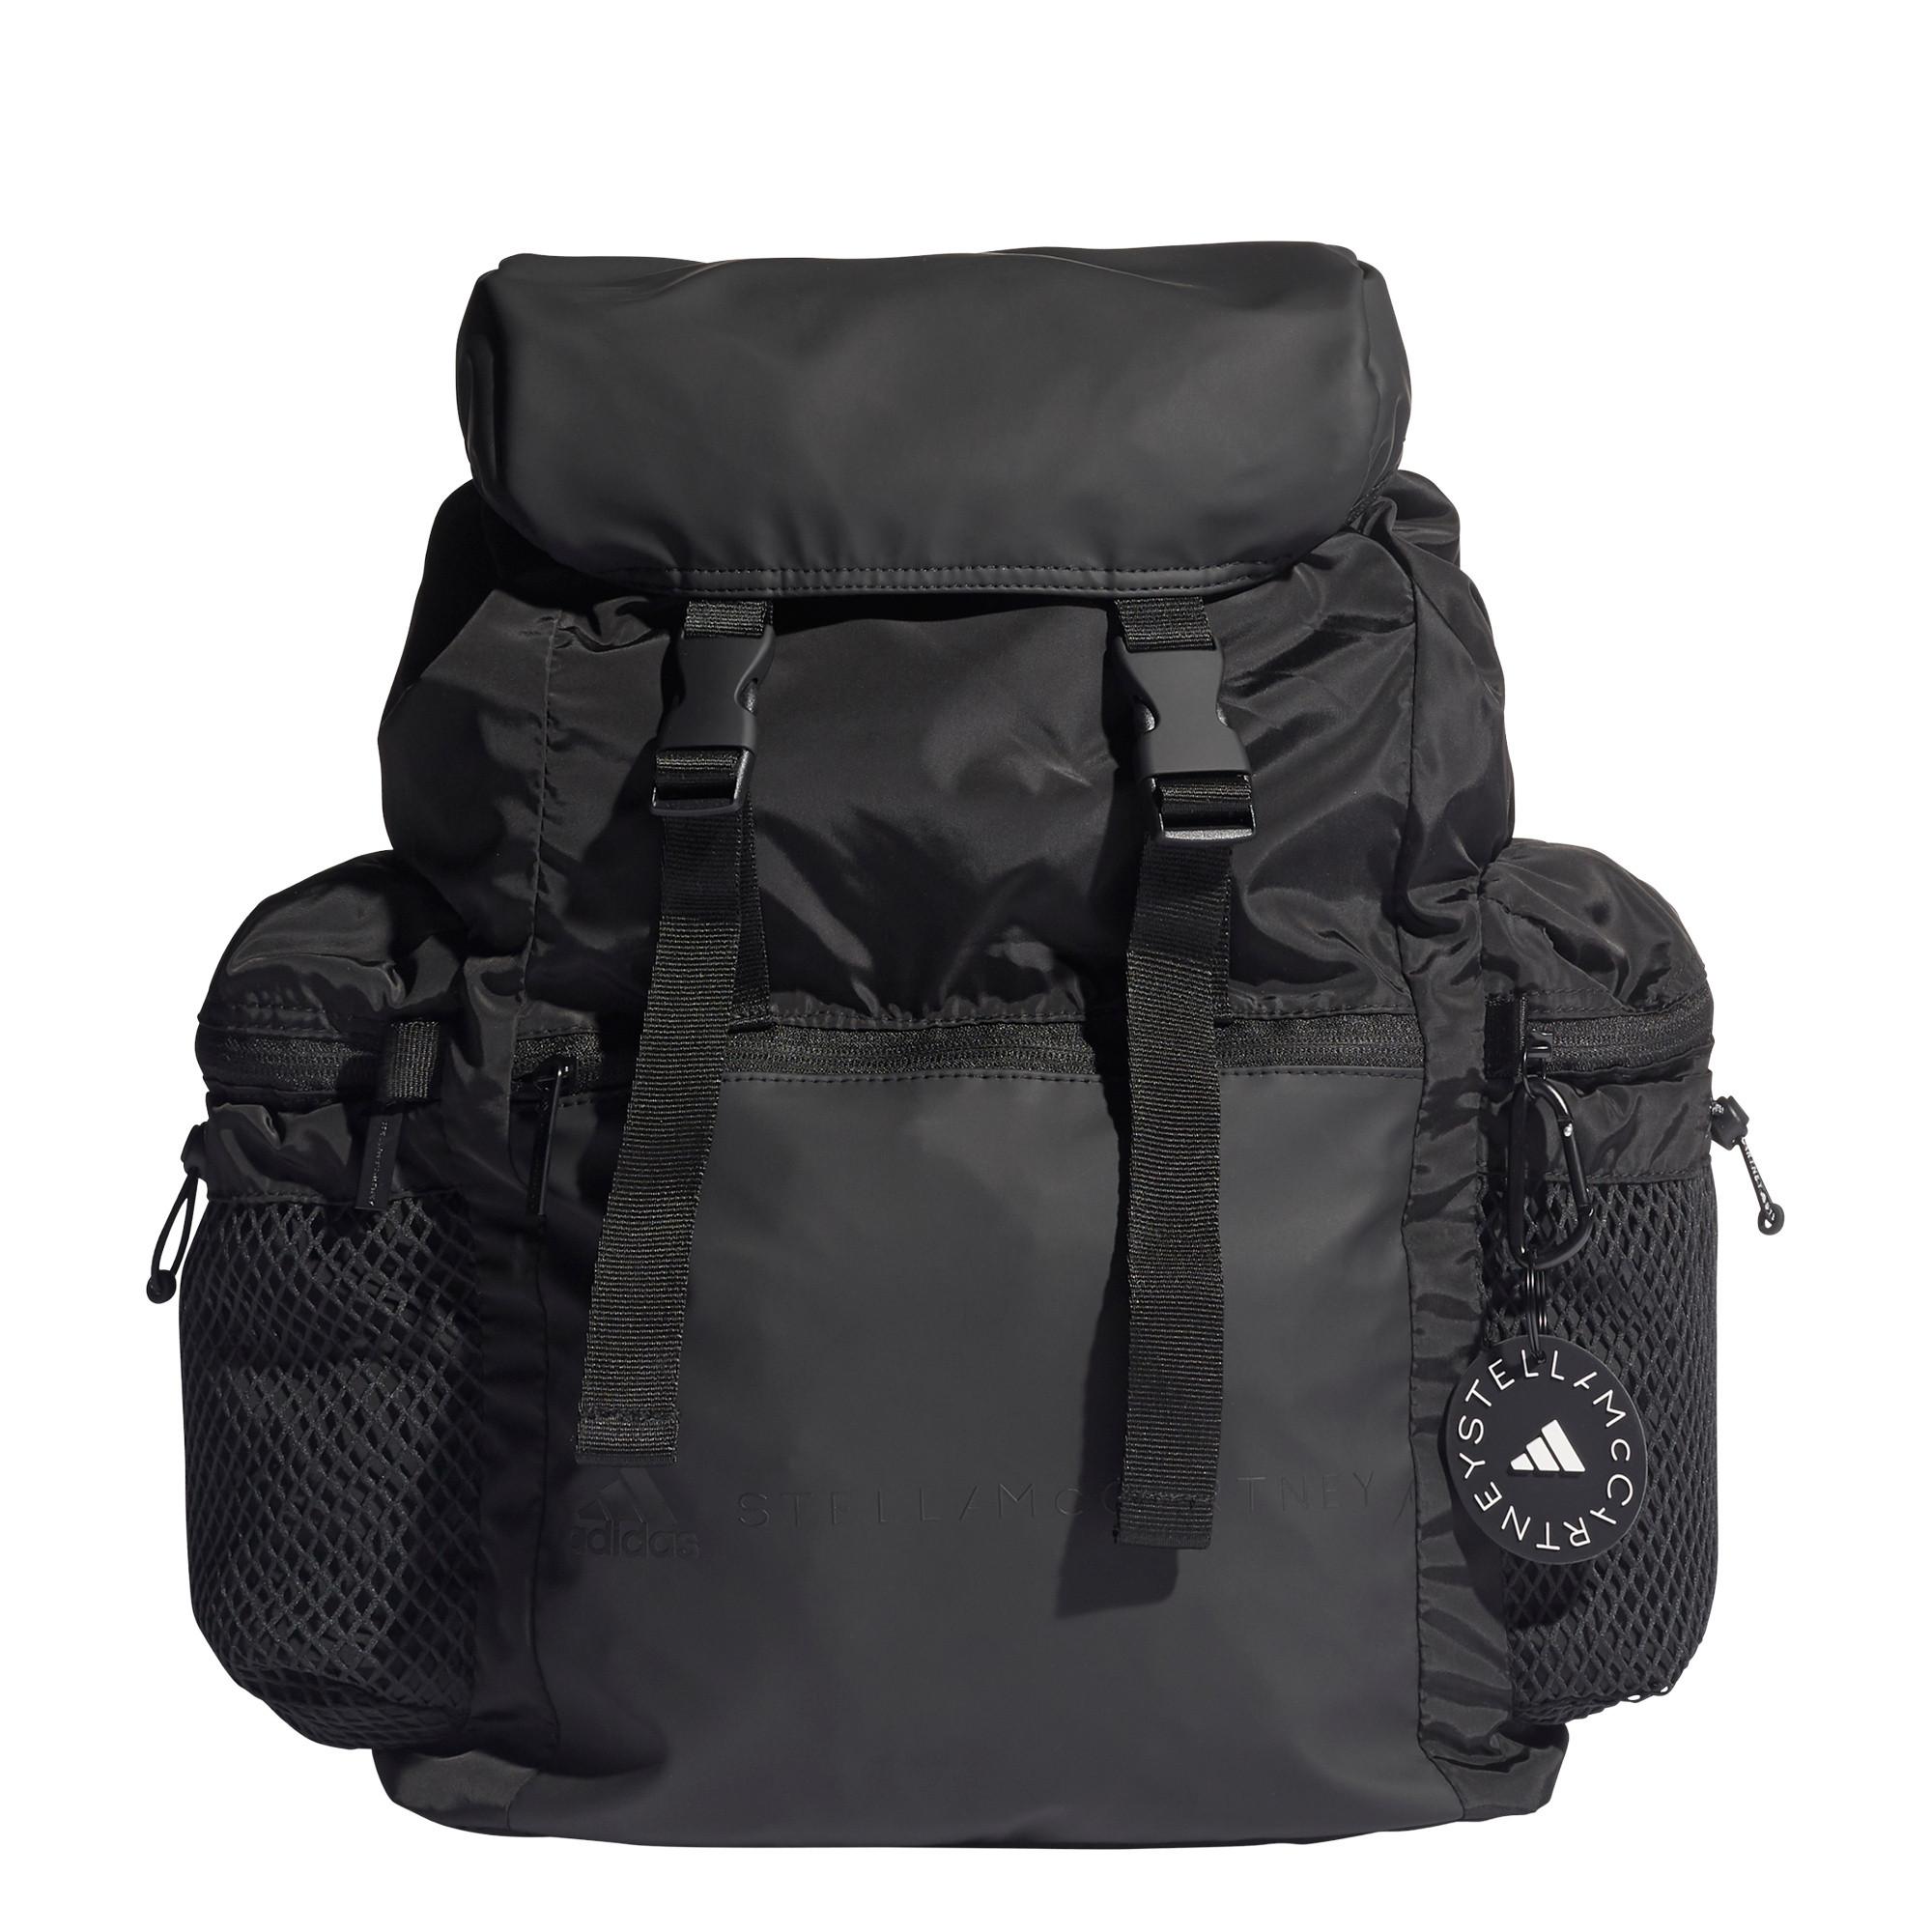 Zaino Asmc Backpack, Nero, large image number 3